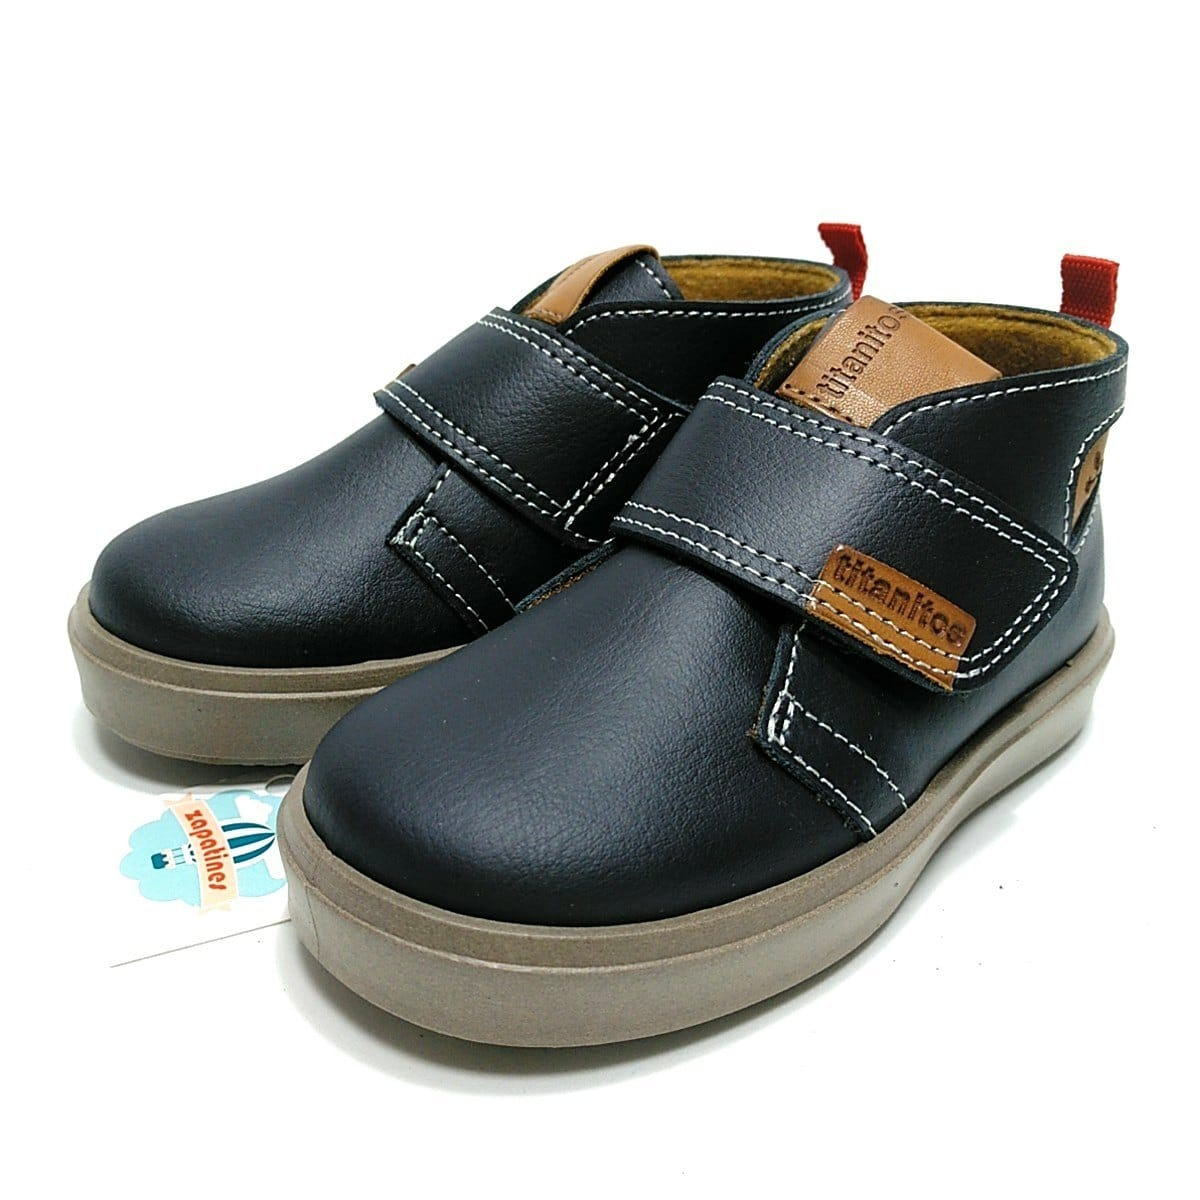 dfd7987ff Titanitos bota piel lavable marino velcro para niños   Zapatines